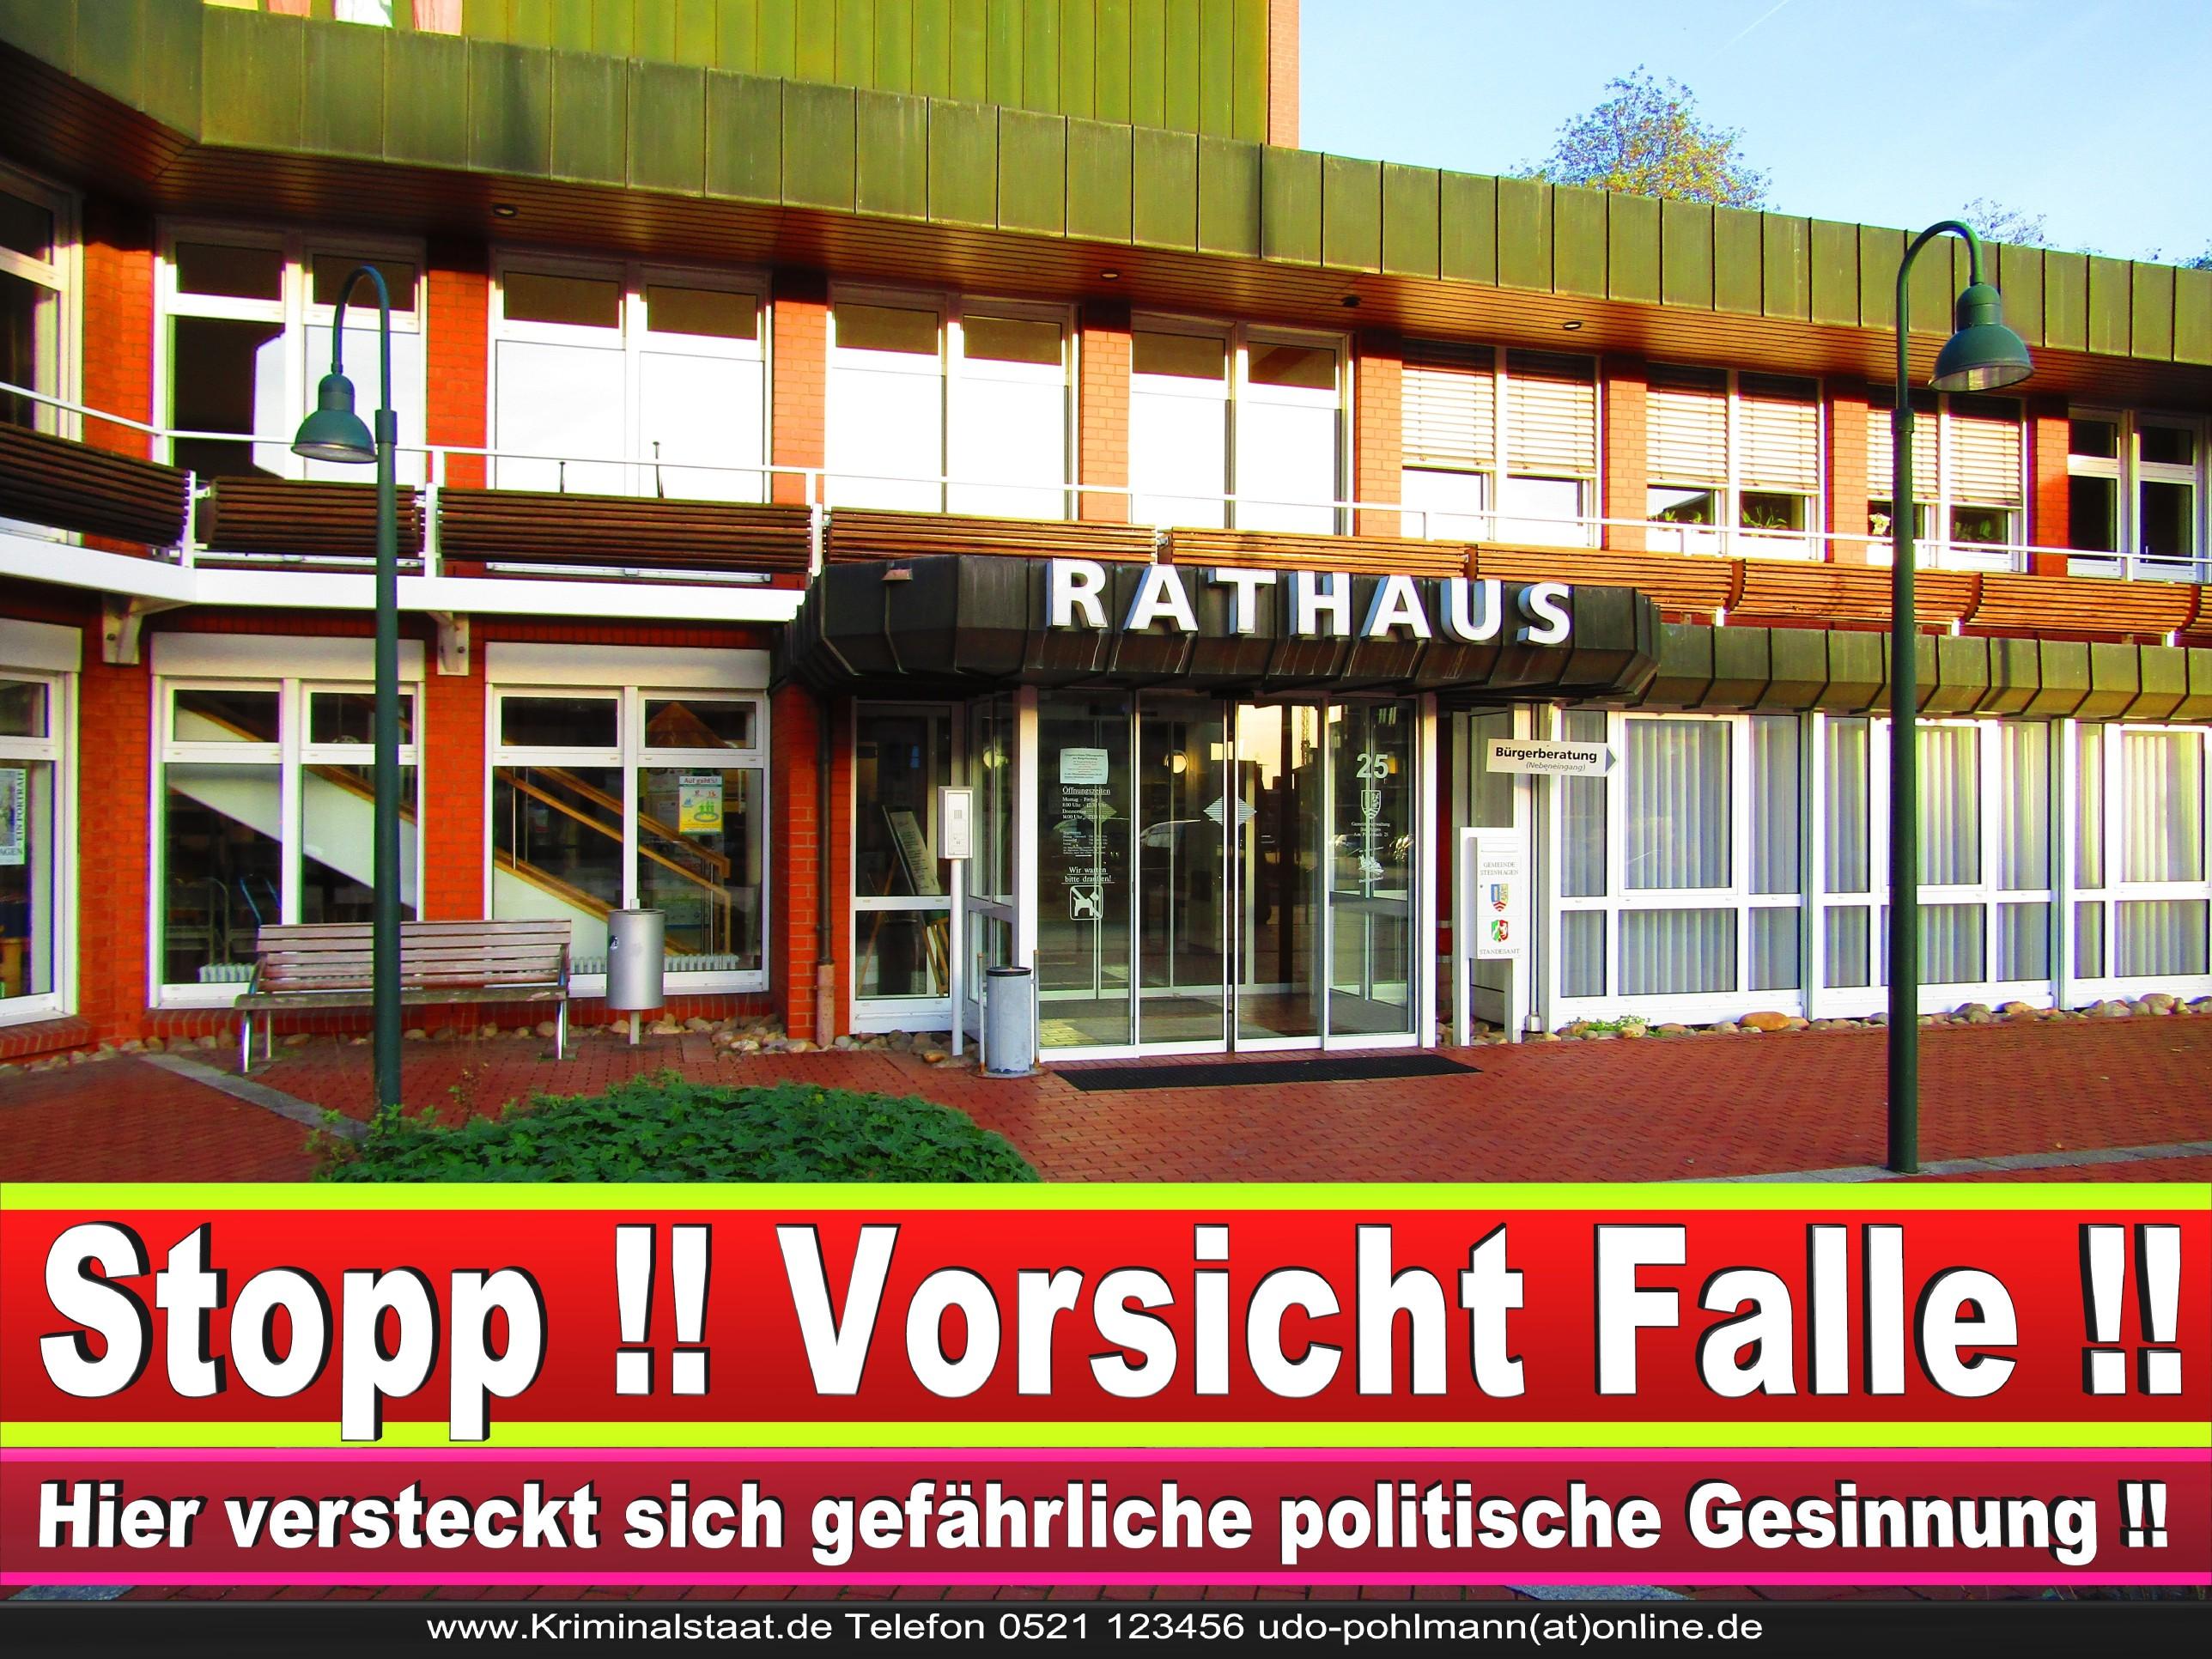 Rathaus Steinhagen CDU SPD FDP Ortsverband CDU Bürgerbüro CDU SPD Korruption Polizei Bürgermeister Karte Telefonbuch NRW OWL (17)